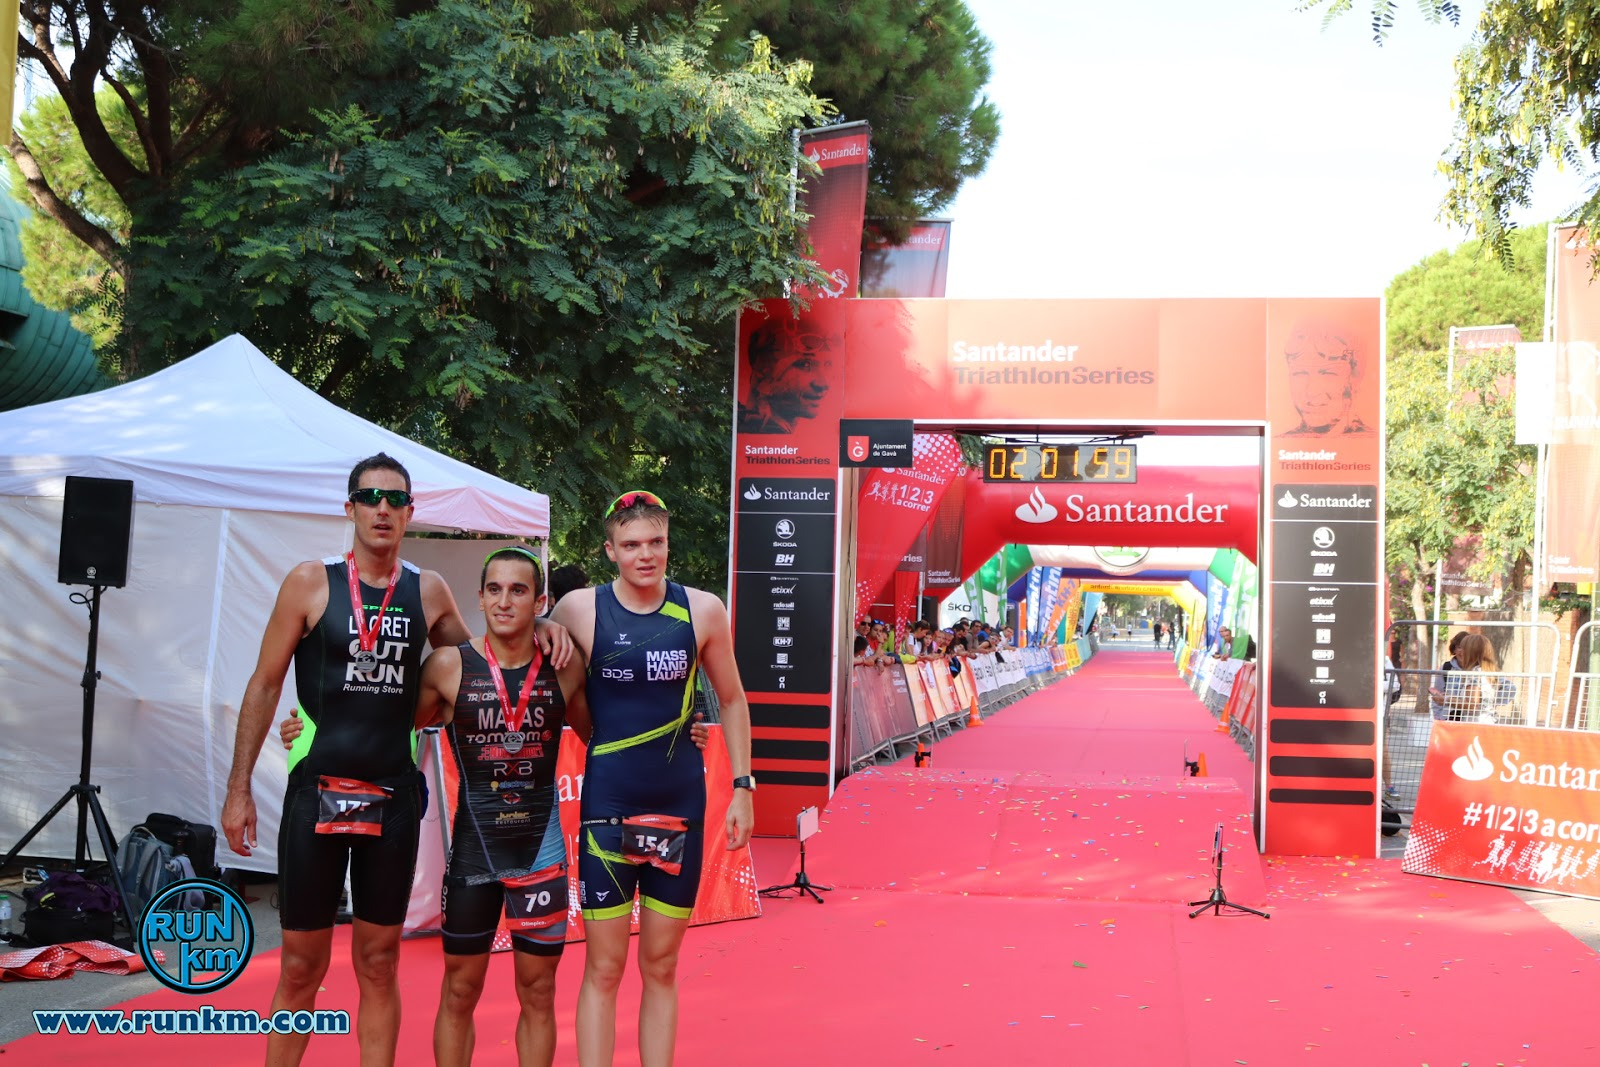 Podio Masculino Santander Triathlon Series Gavà 2017